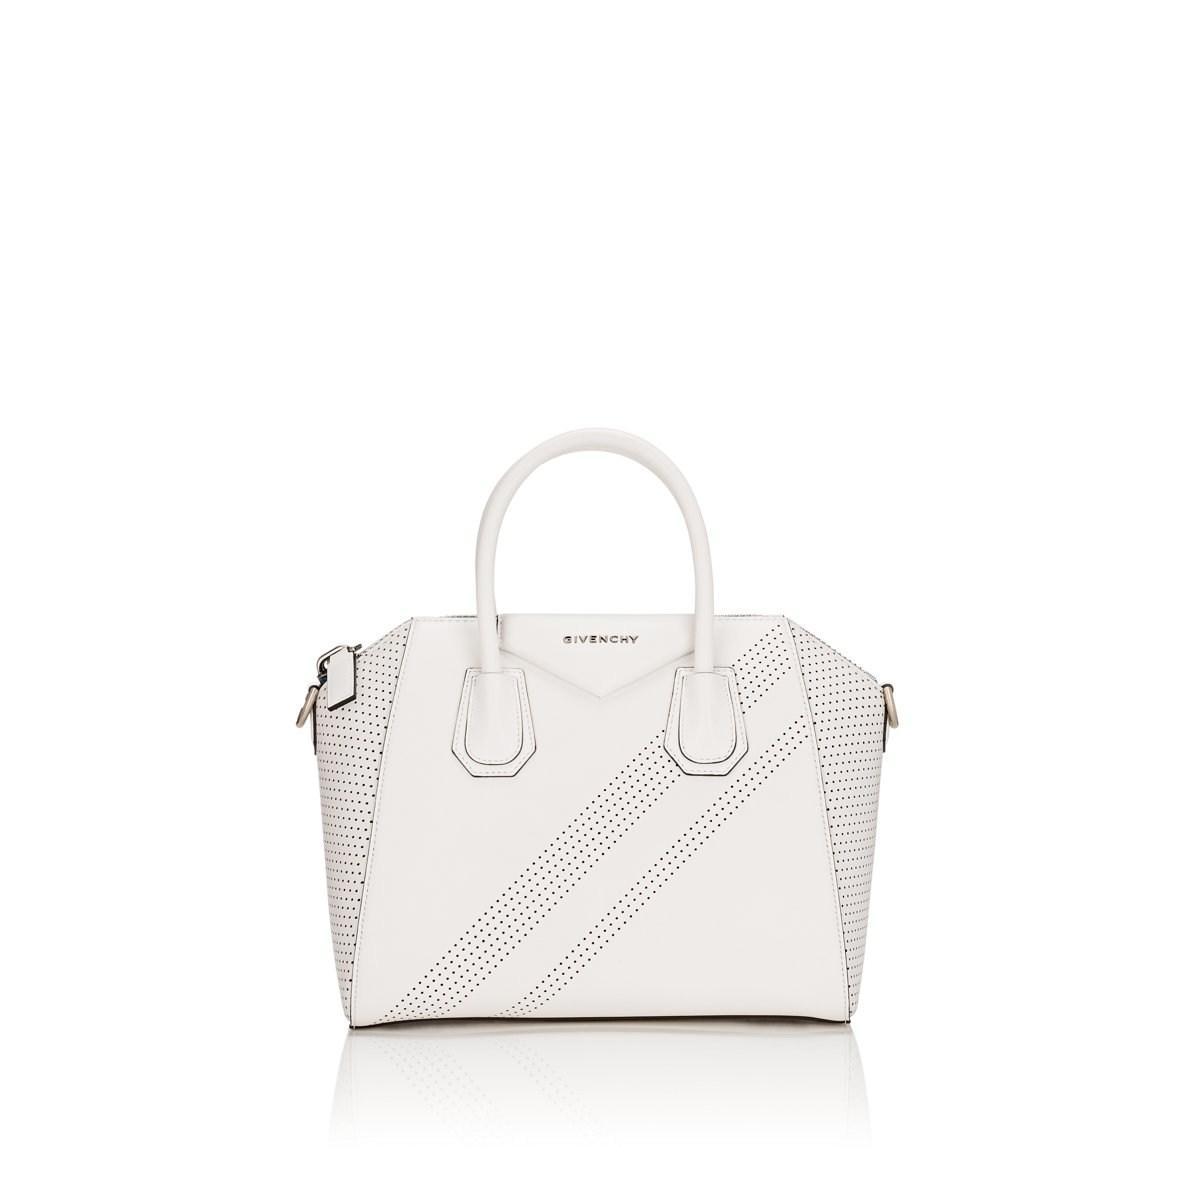 Givenchy - White Antigona Small Leather Duffel Bag - Lyst. View fullscreen a19bd523f6b53